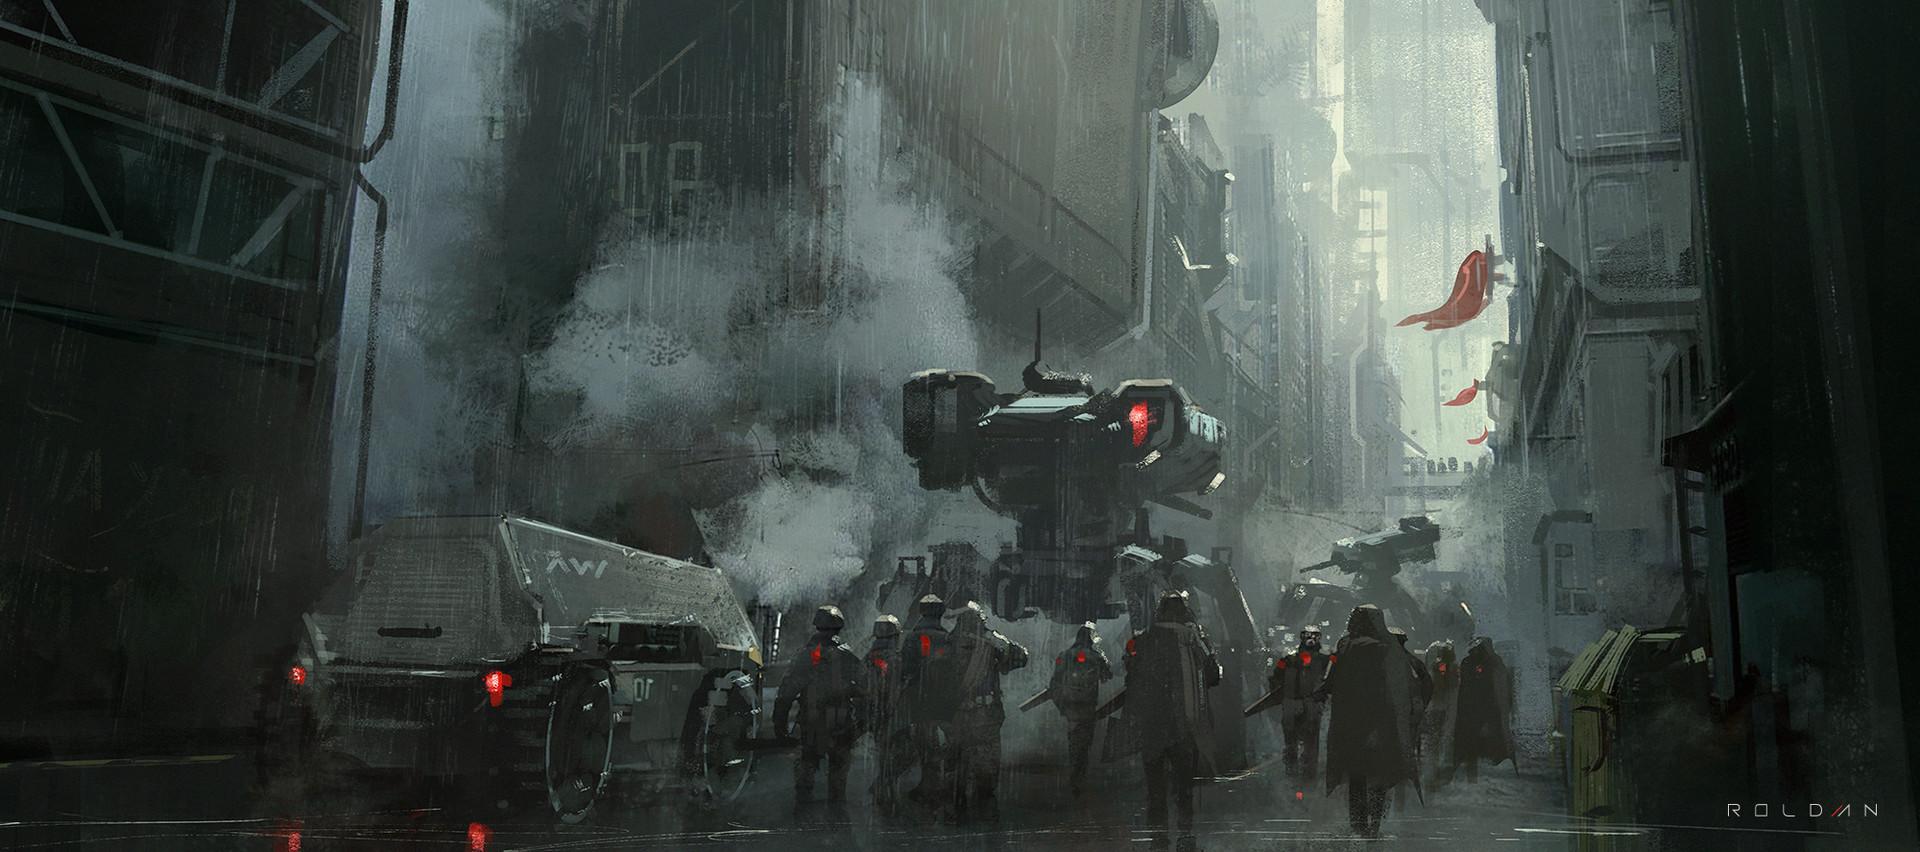 Juan pablo roldan robotstreet 4